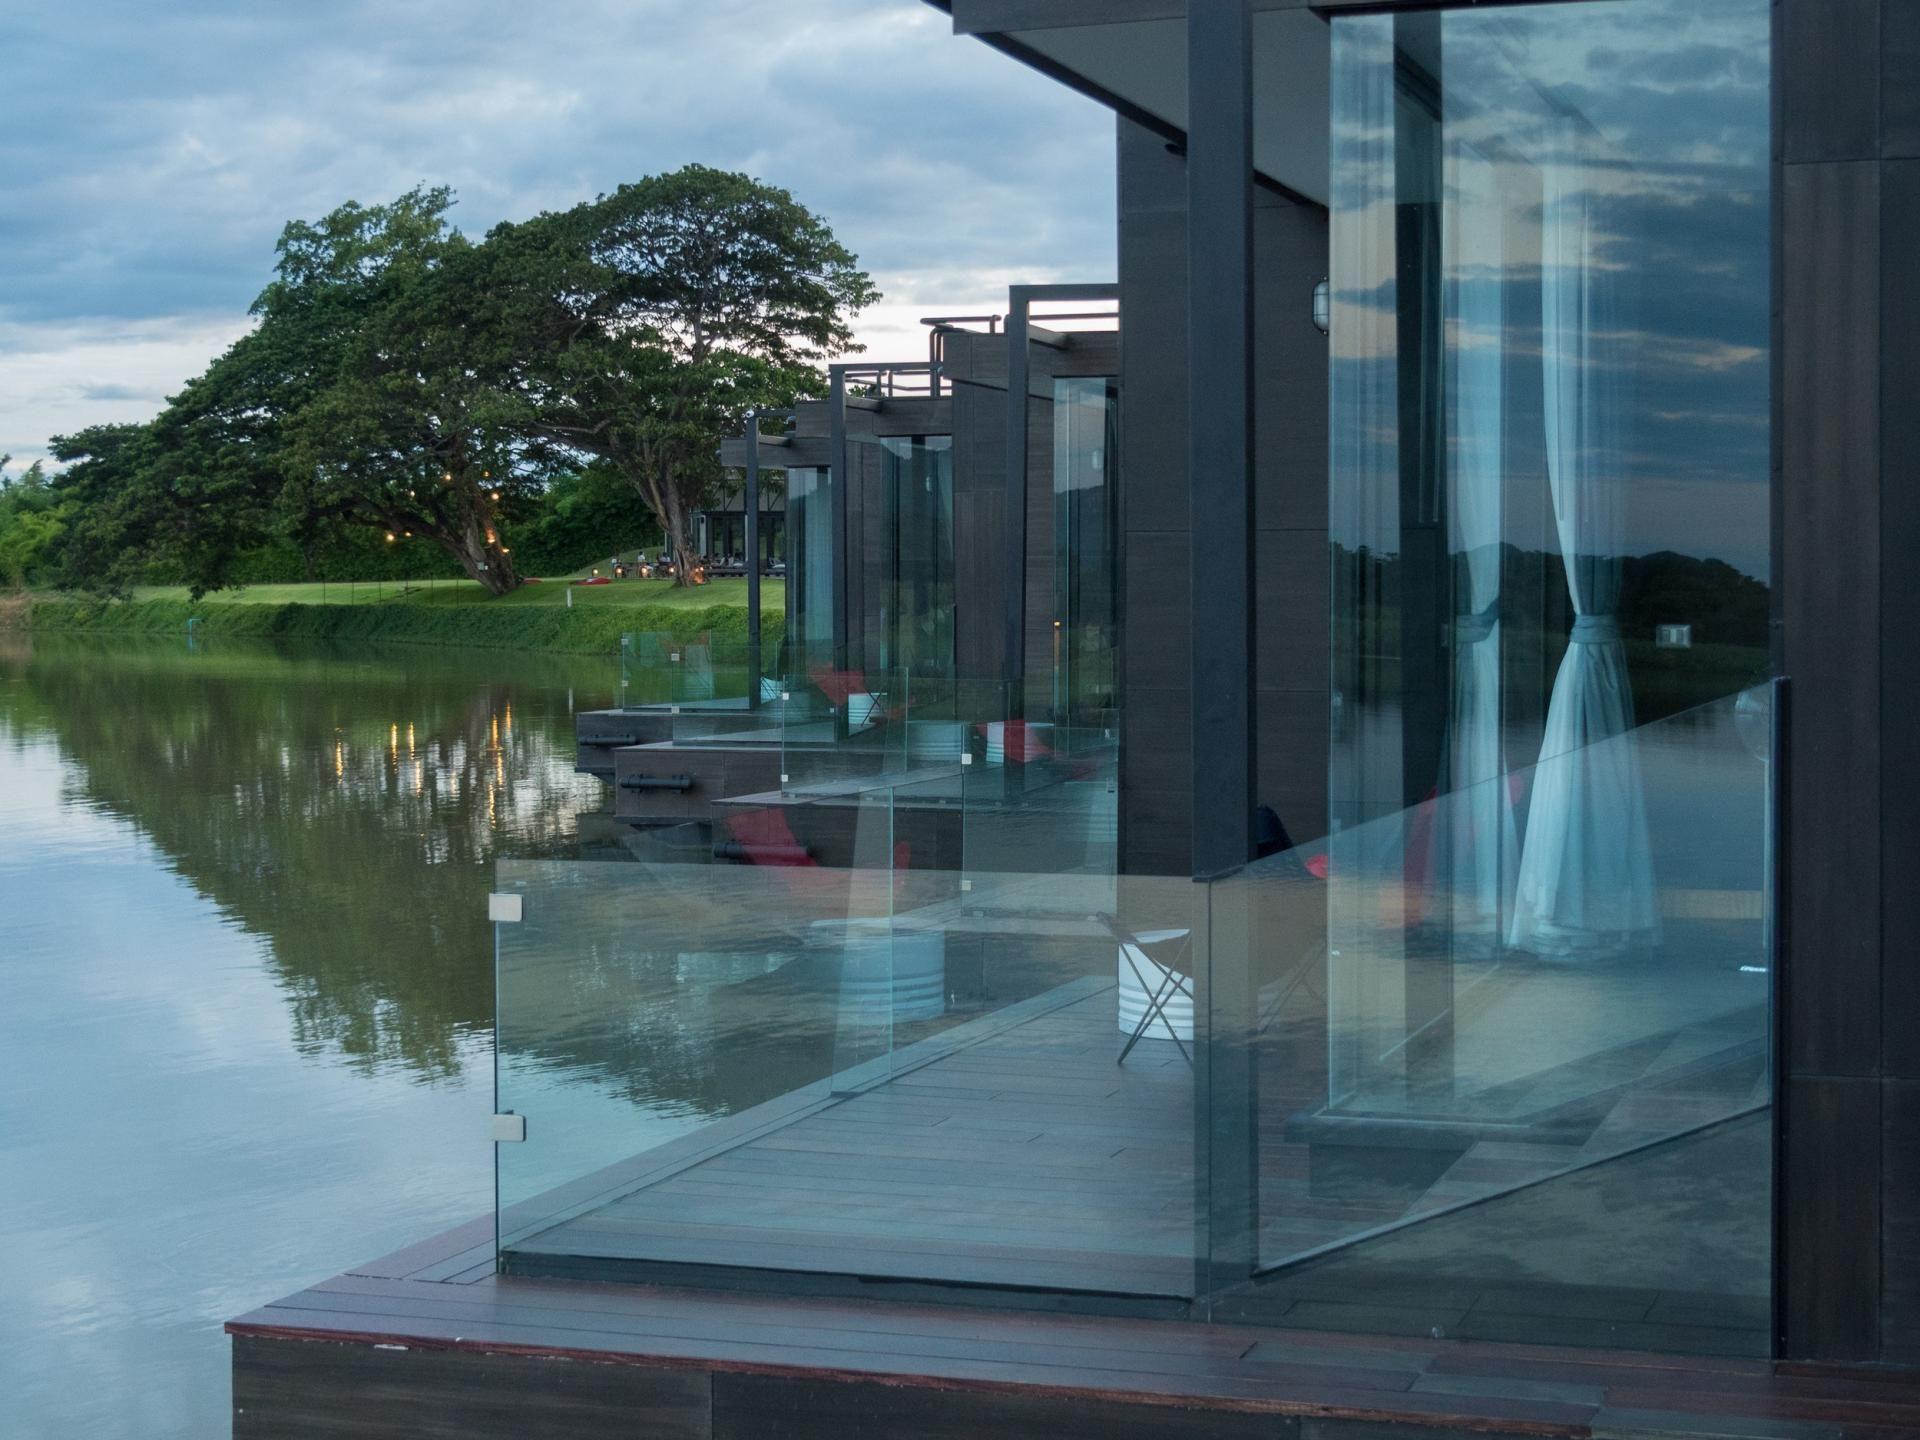 Agaligo Studio Designs Floating Homes on the River Kwai | Studio ...